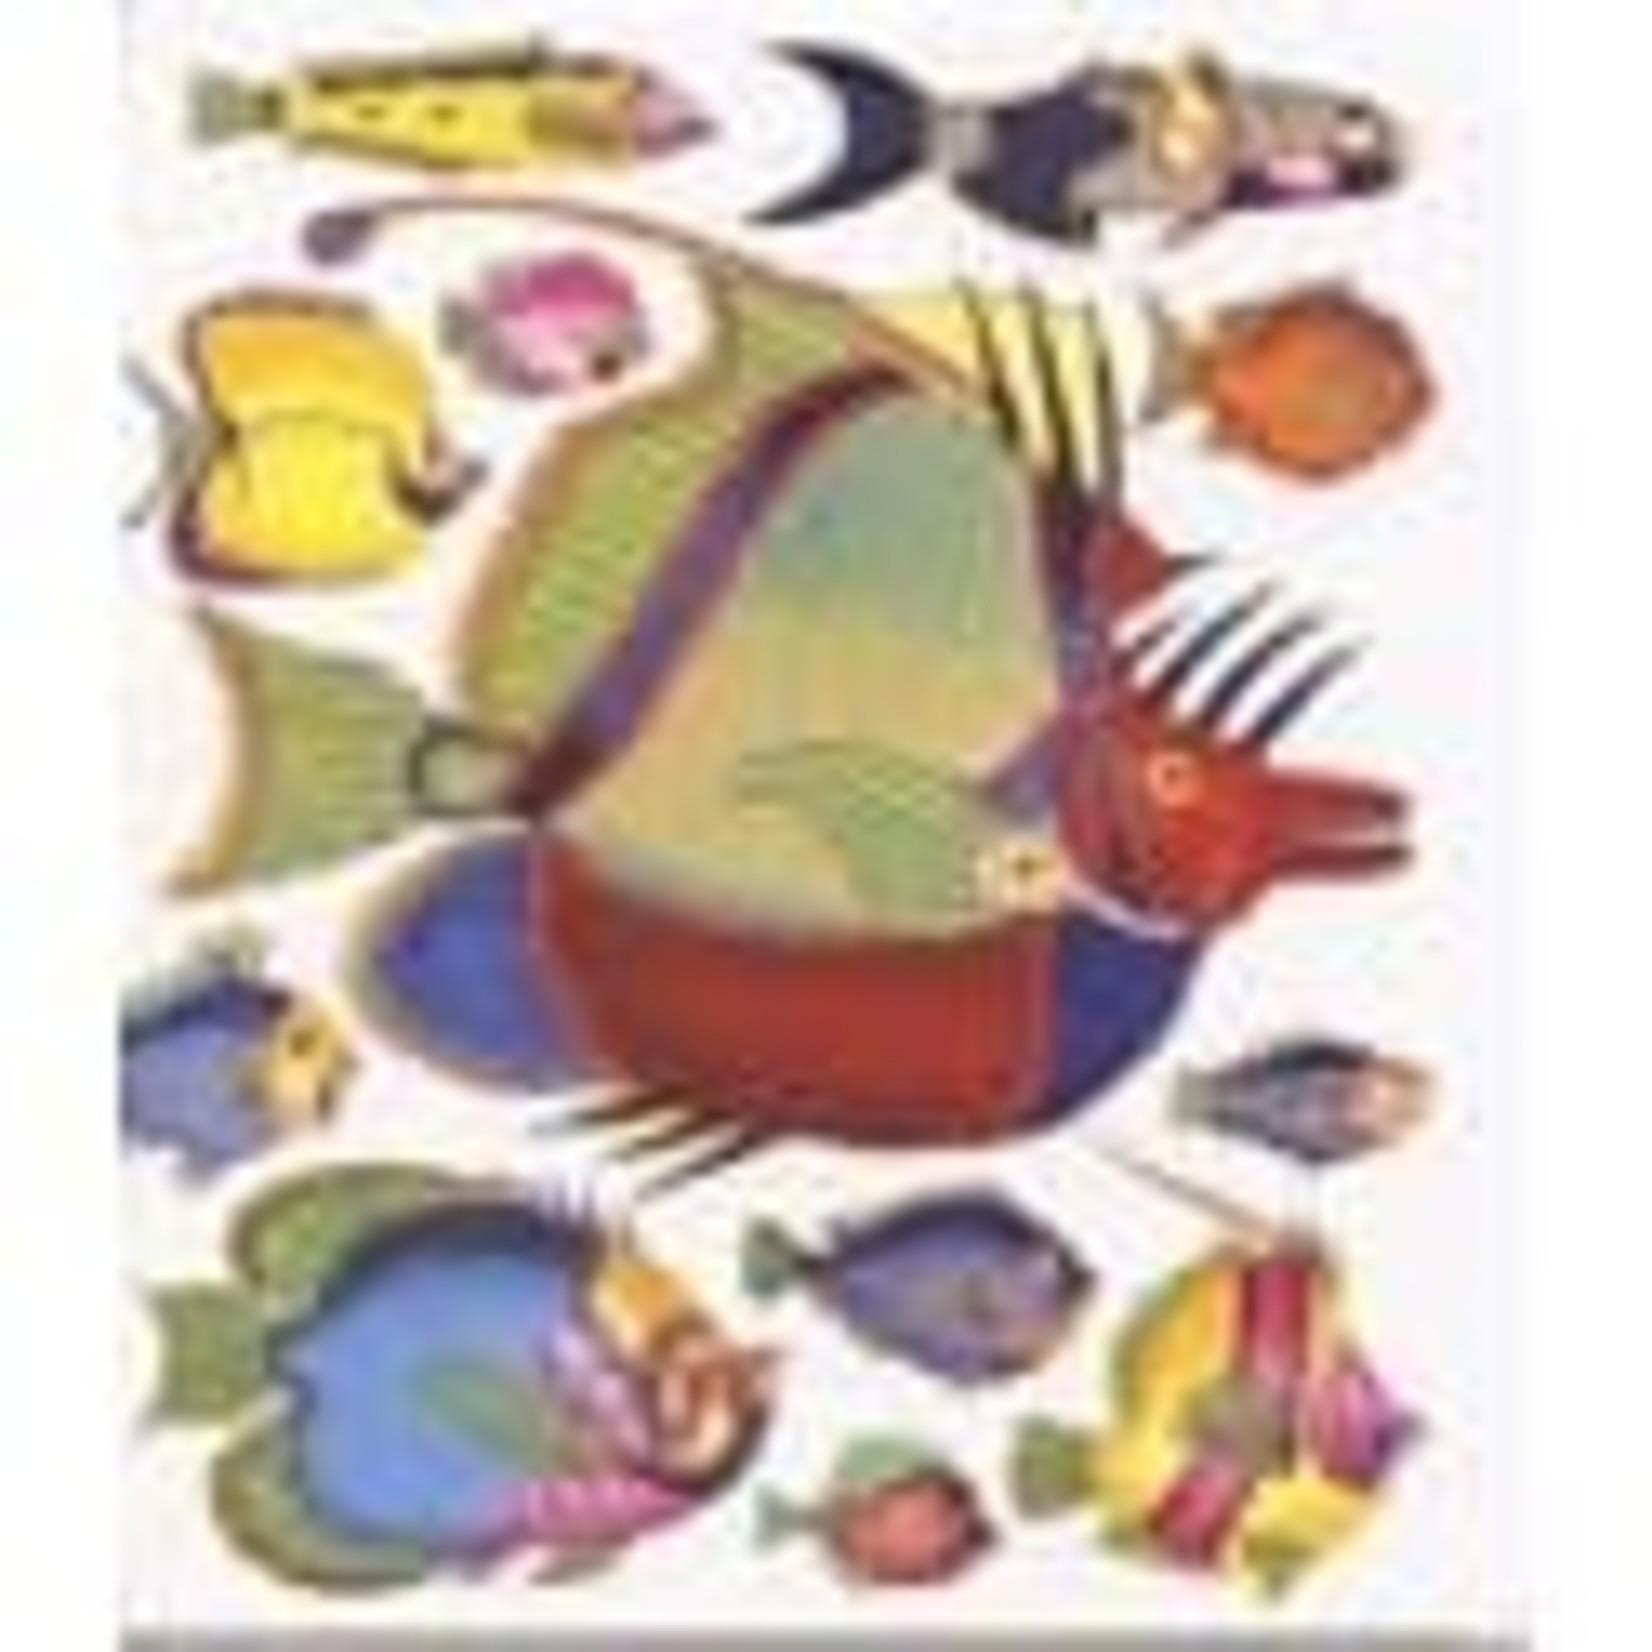 Archivist Renard Fish